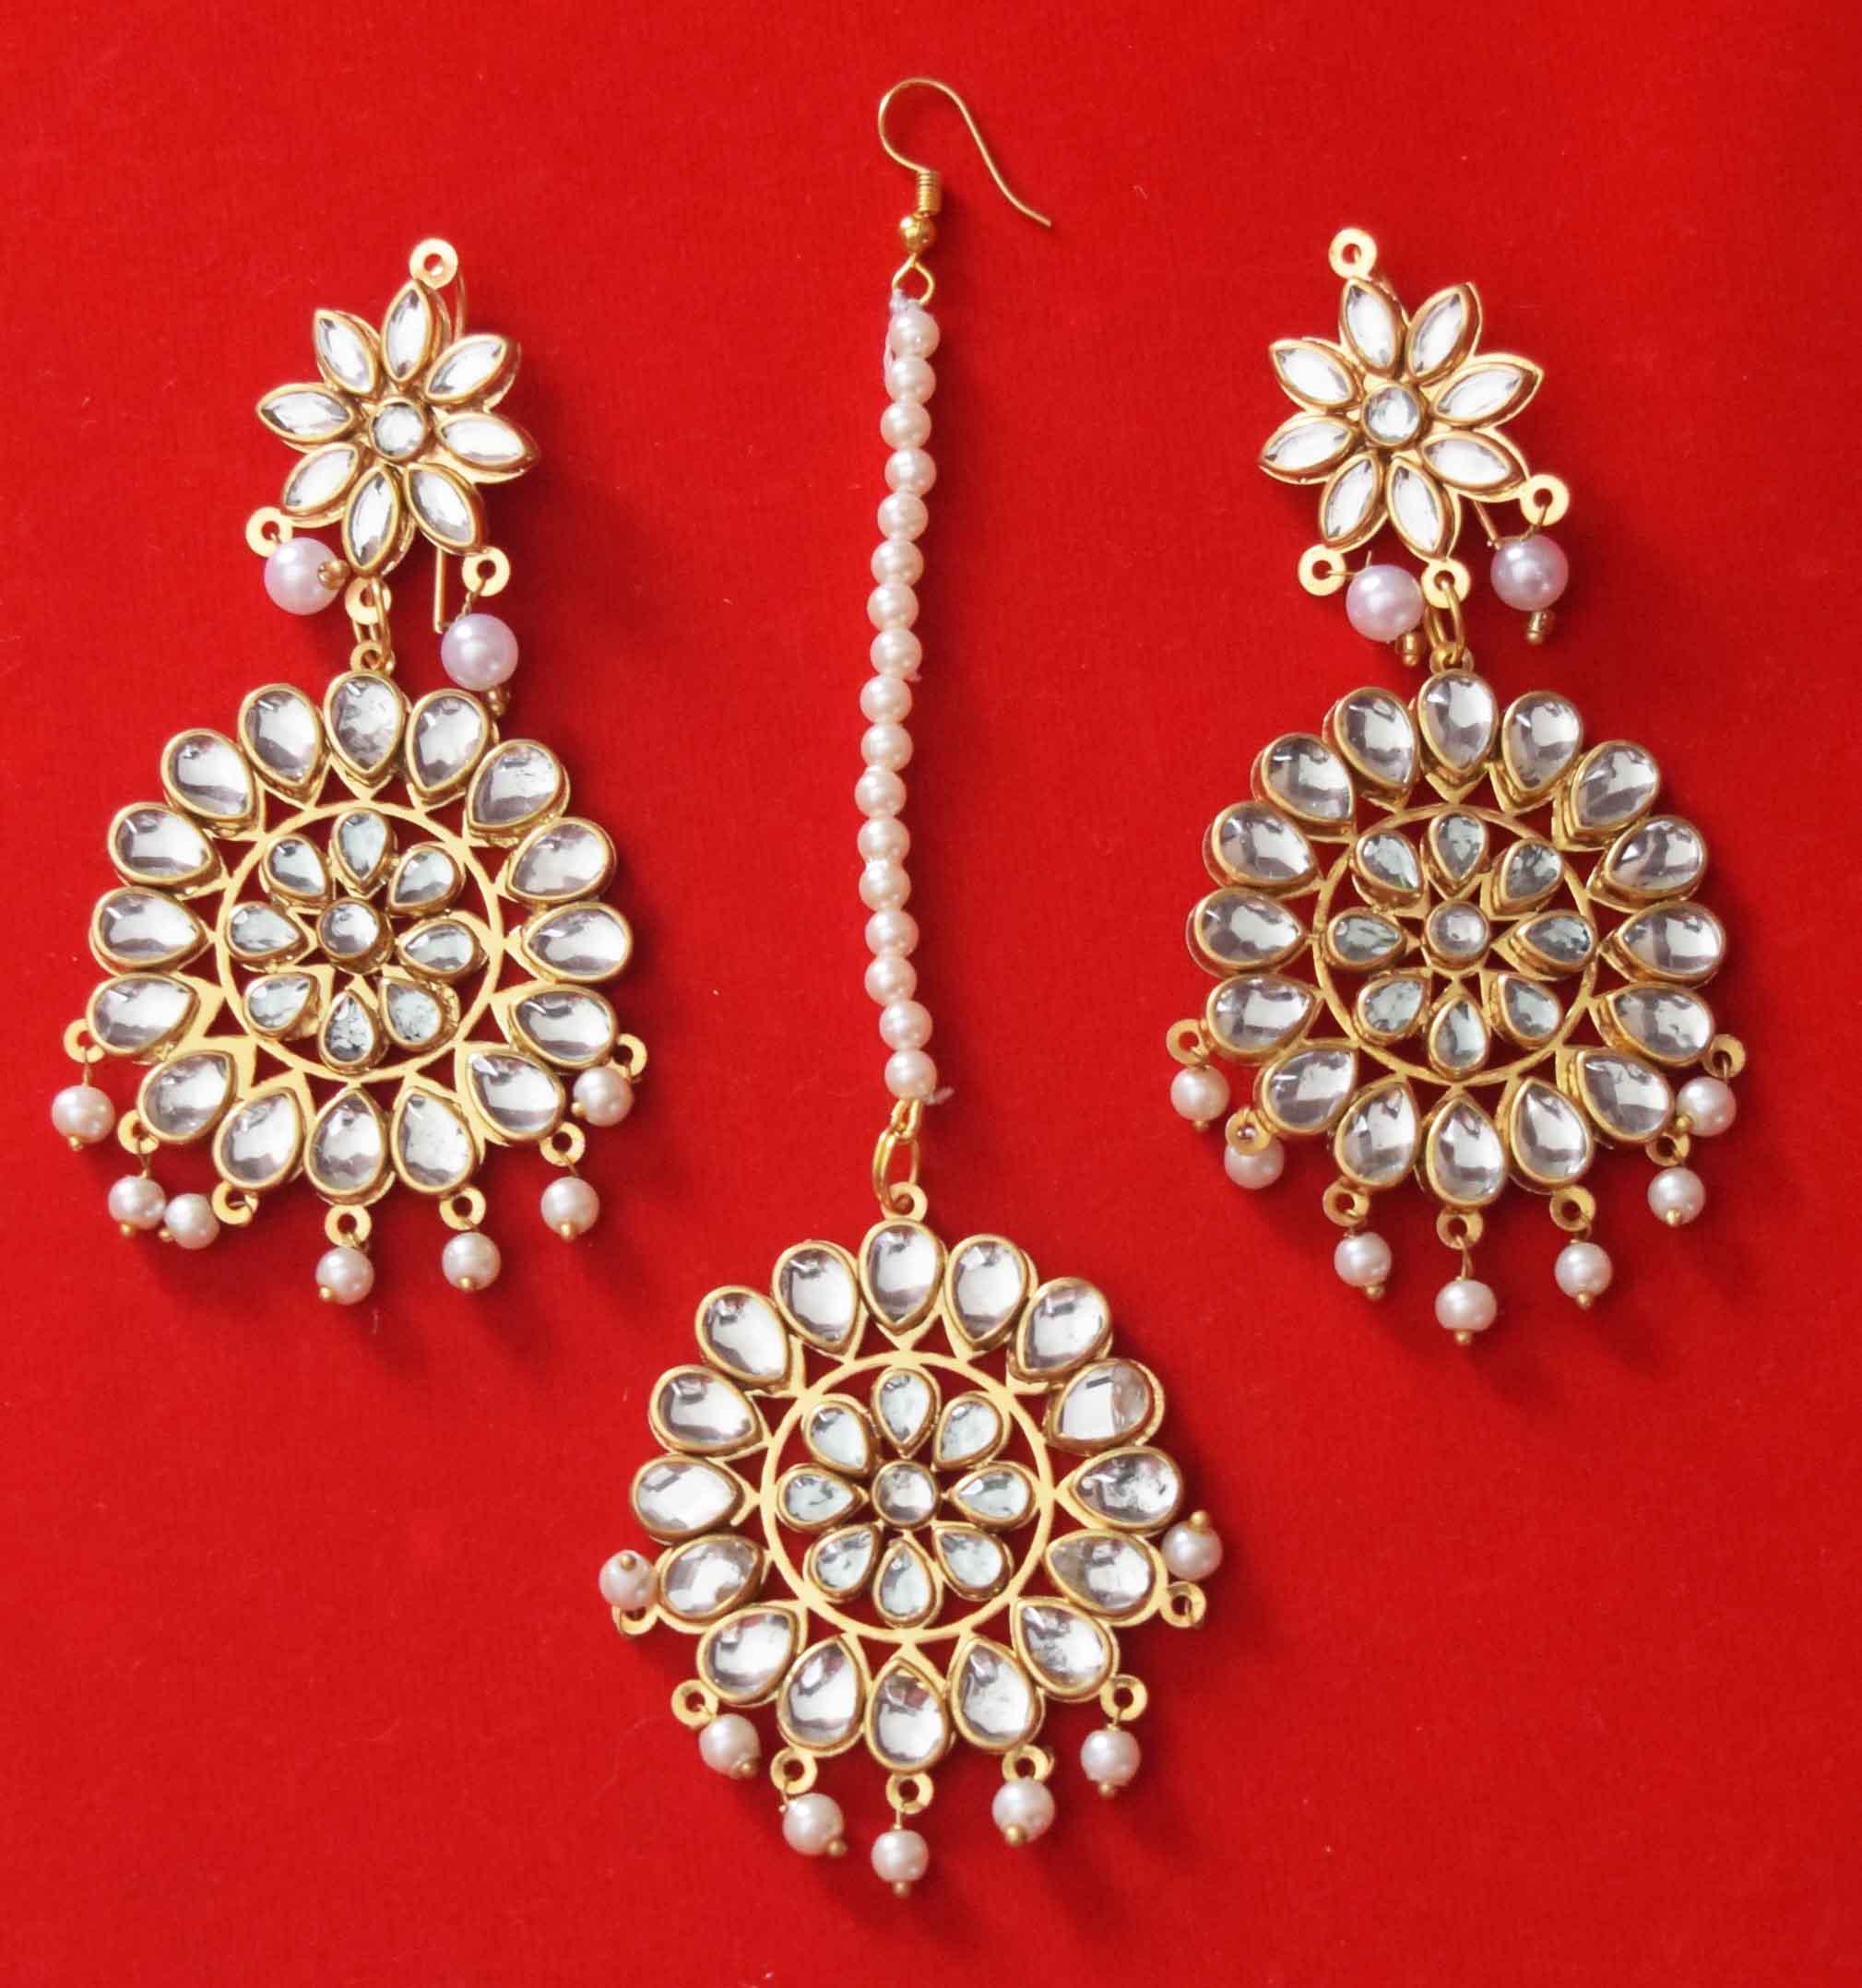 Kundan Work Punjabi Traditional Jewellery Earrings Tikka set J0467 2